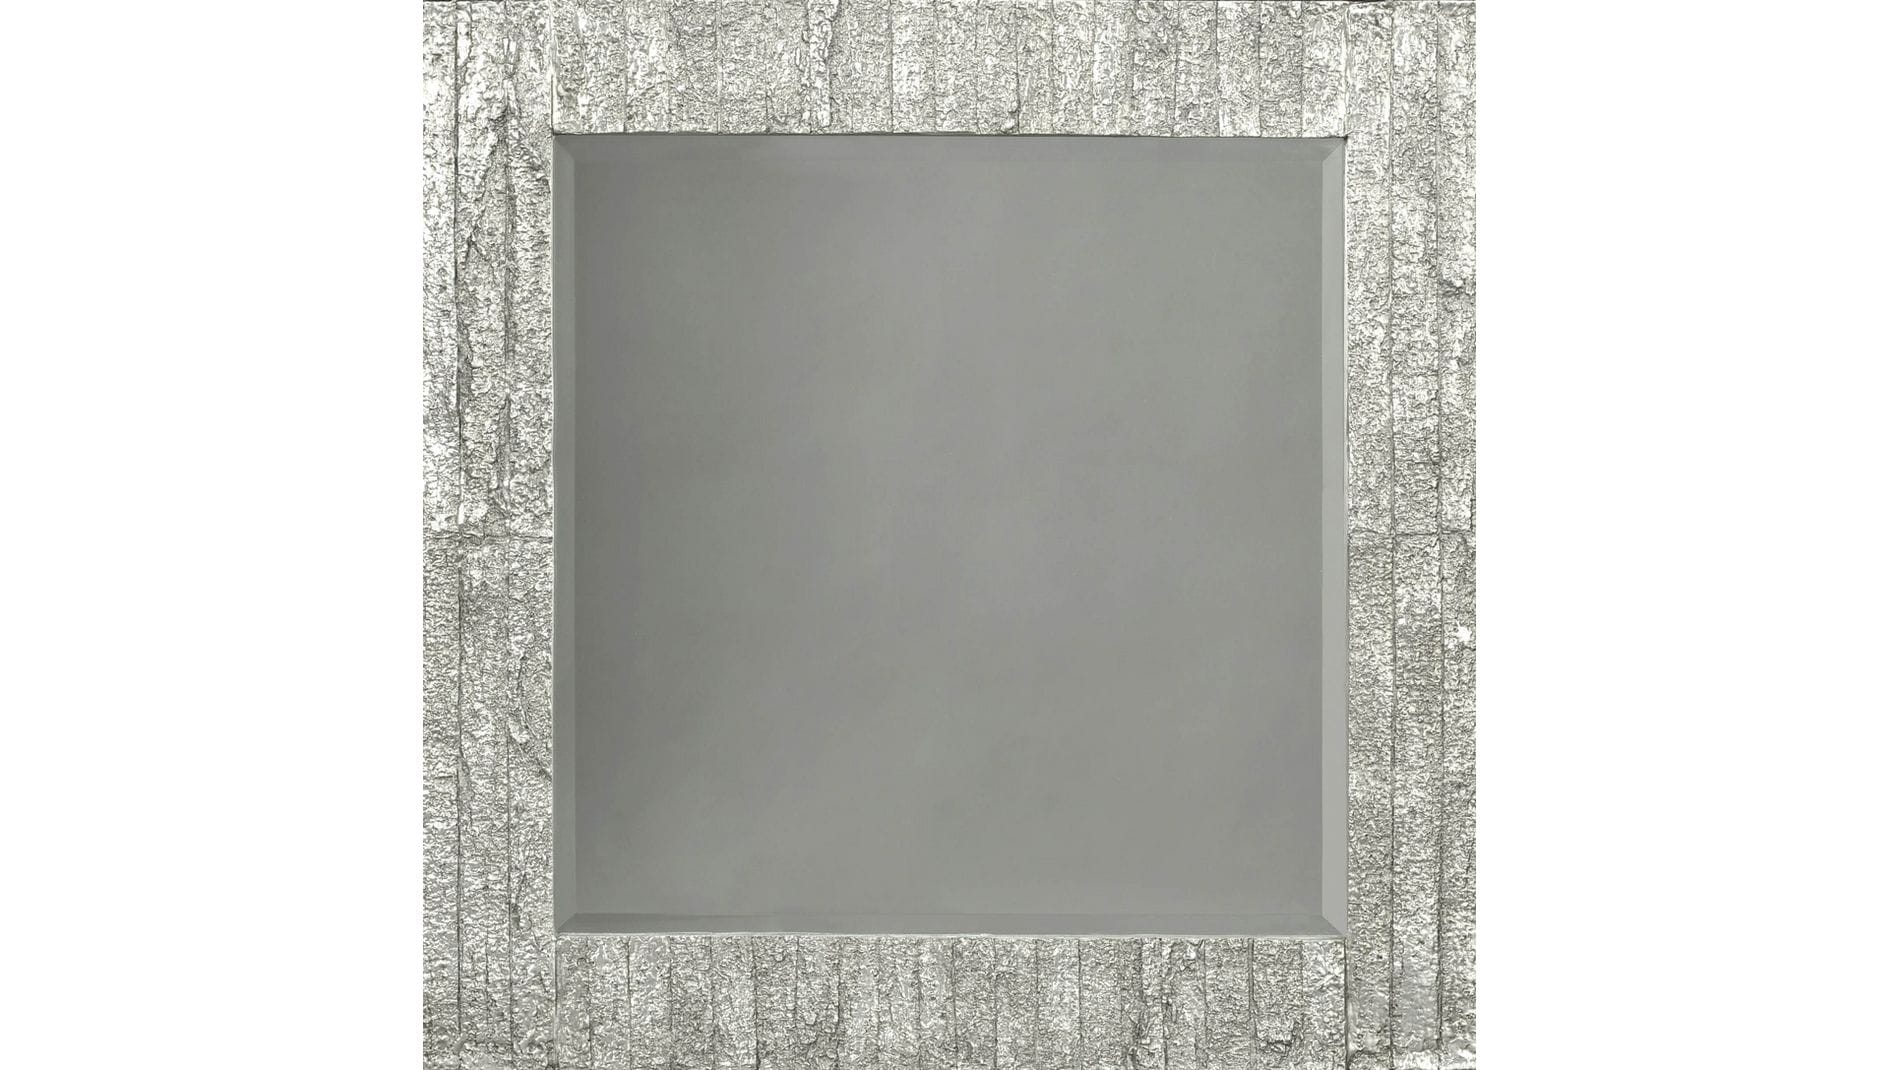 "Панно для декорирования стен "" Зеркало квадрат "" 80*80 см."